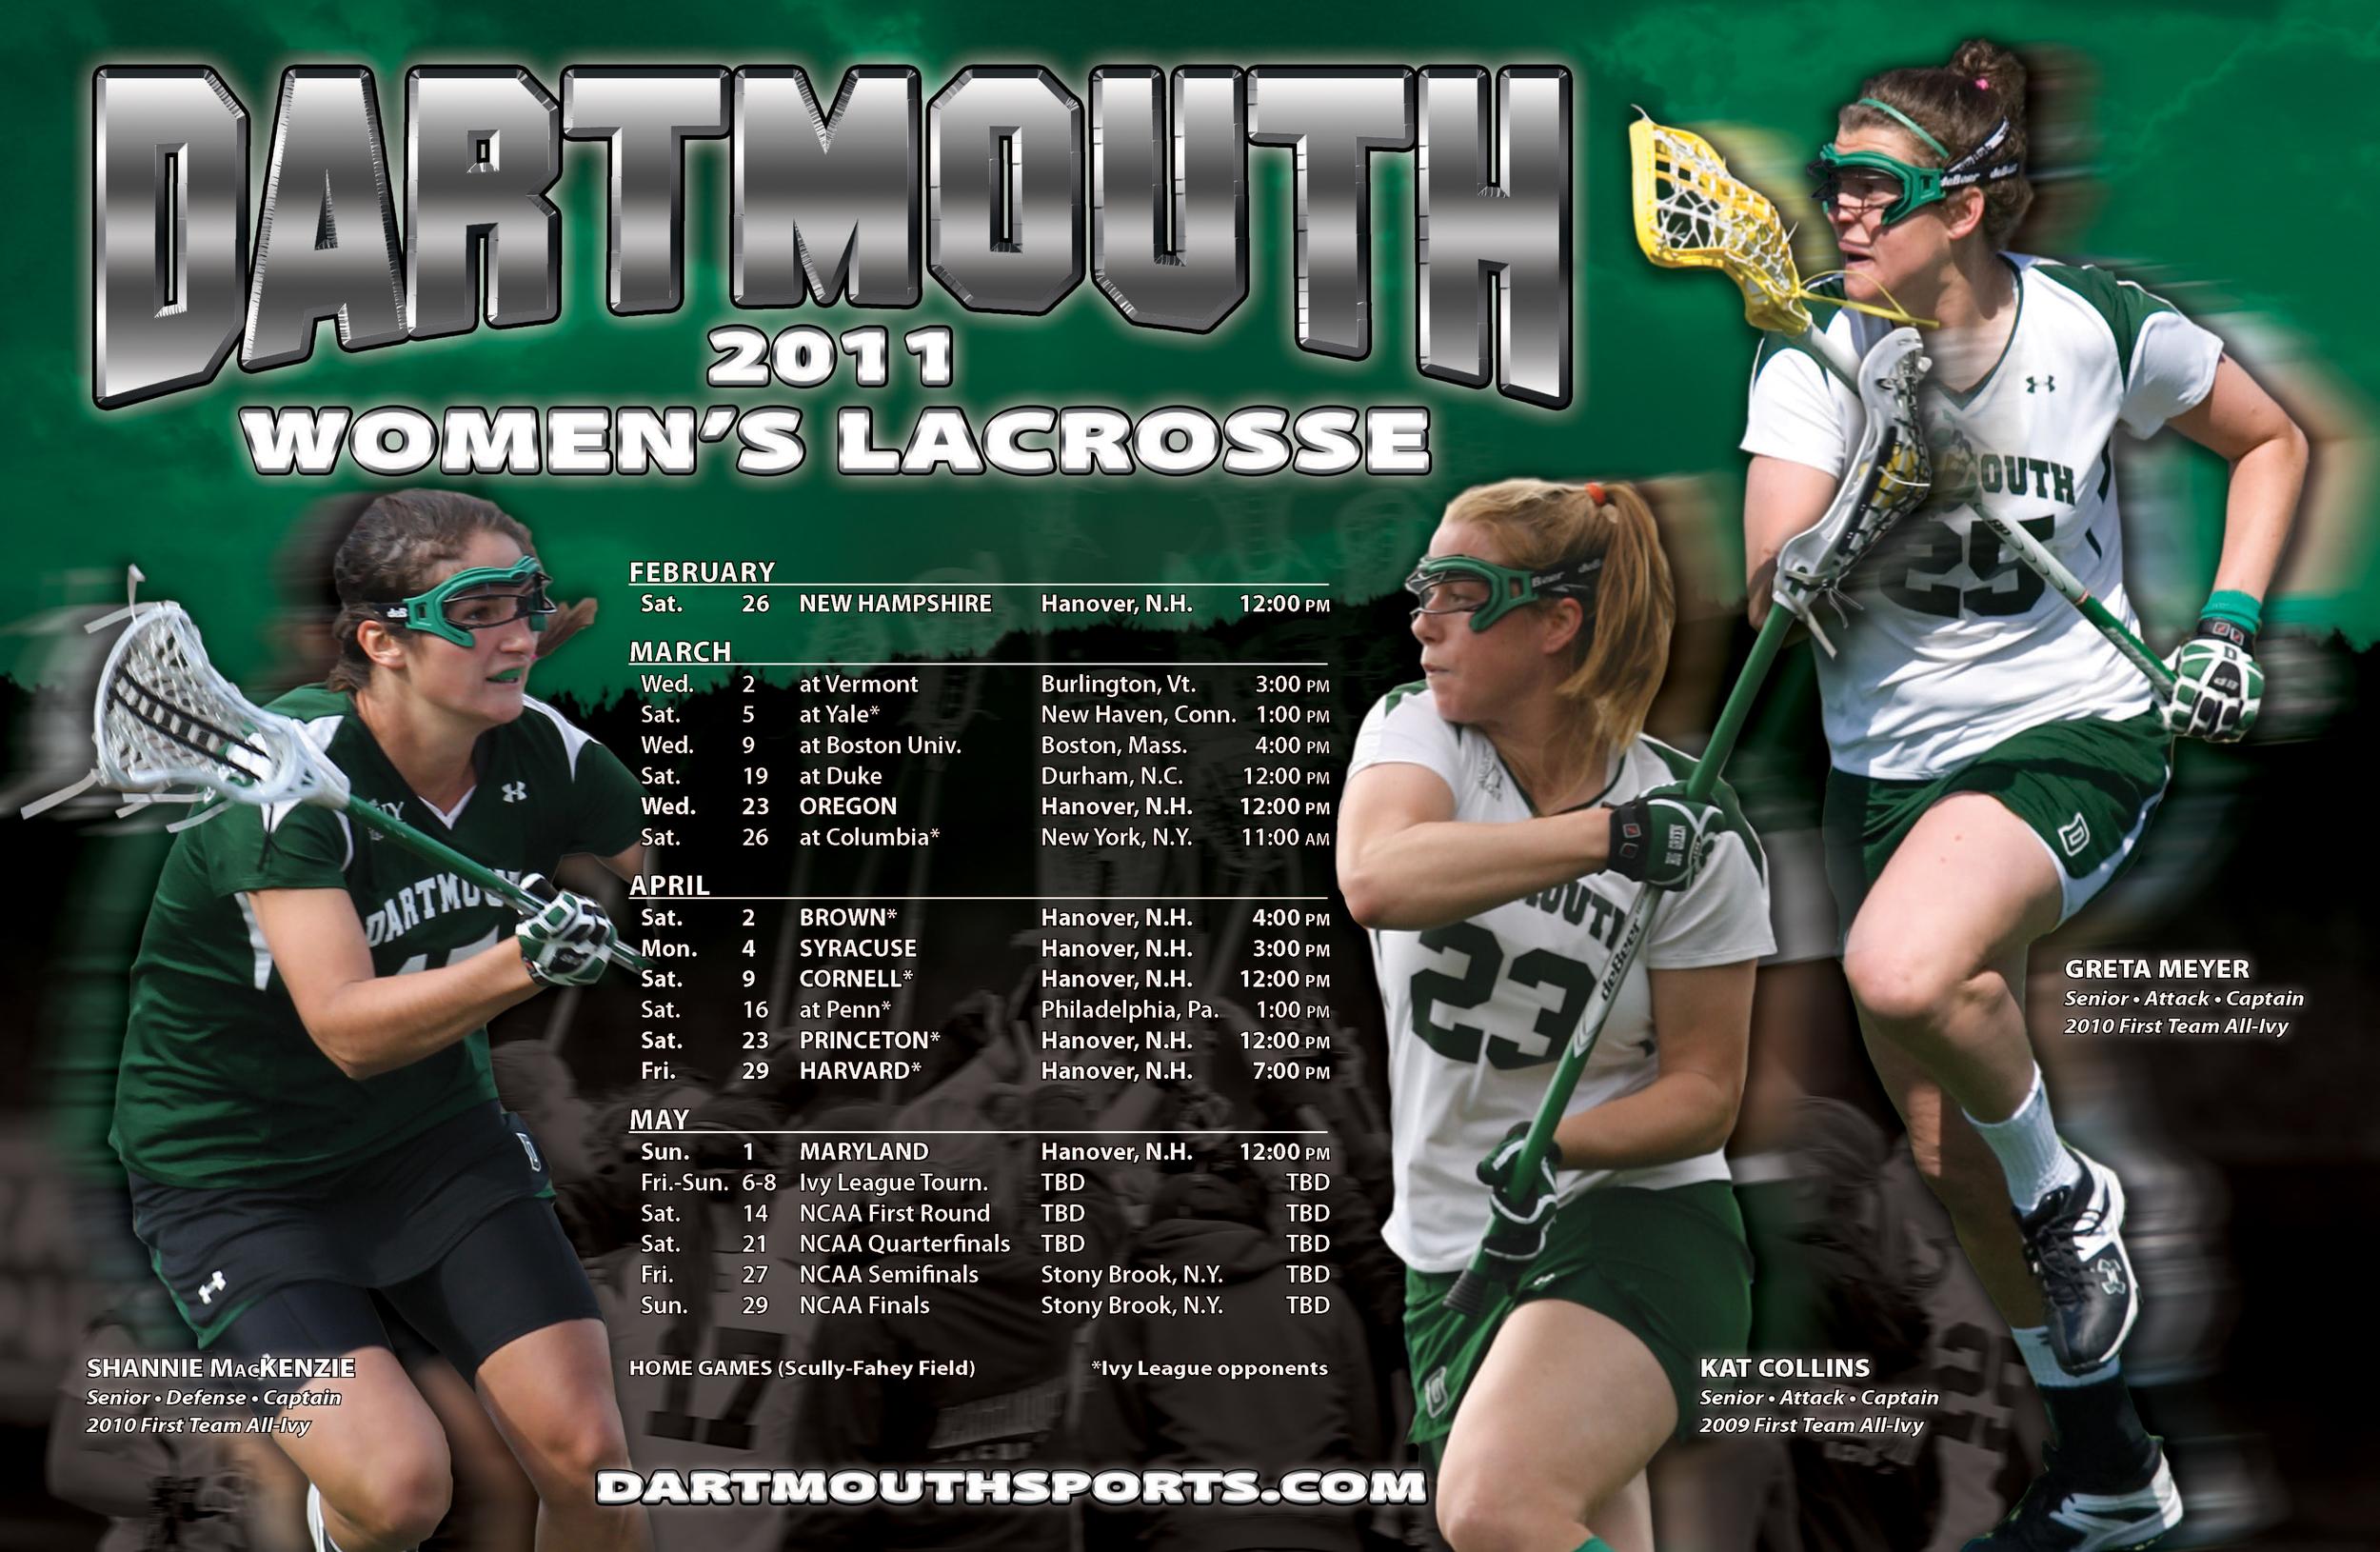 2011_WLacrosse_Poster.jpg